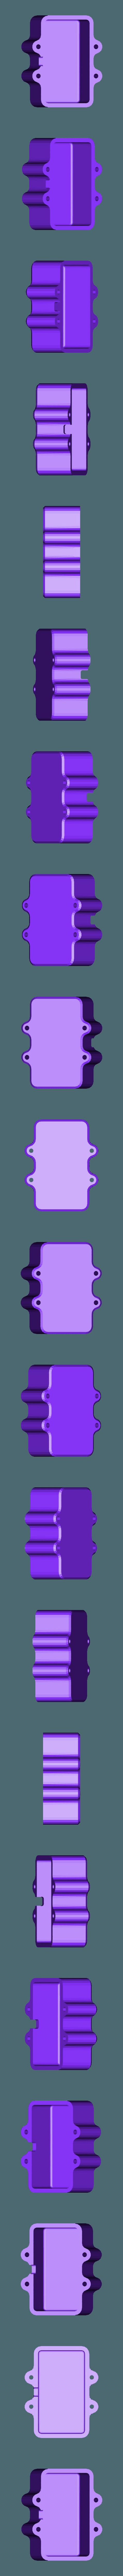 Radio box case.STL Download free STL file 1/10 RC 4WD TRUGGY BT250.2 • 3D printer object, ivnssnn